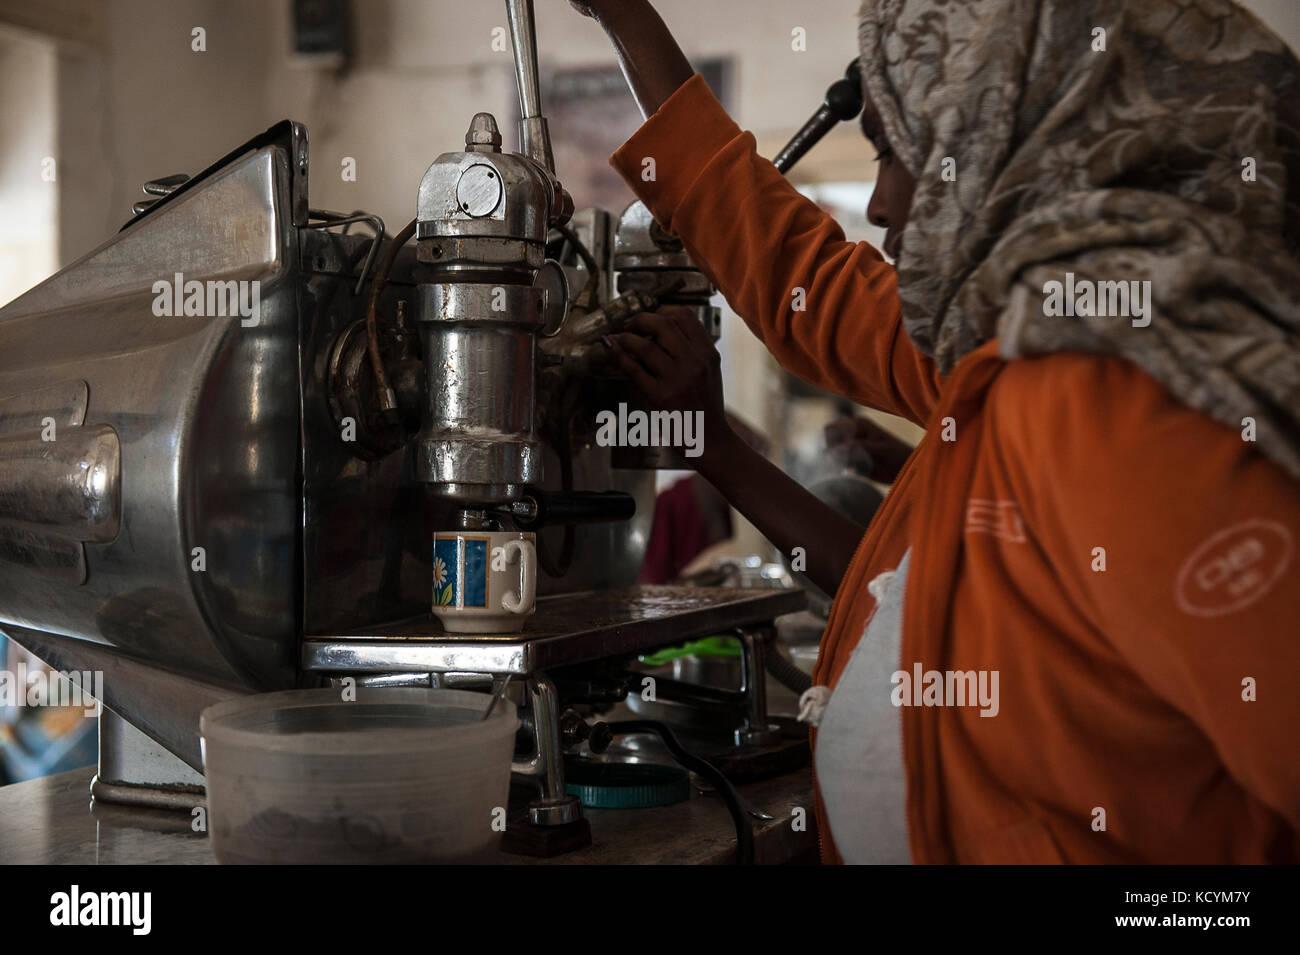 Fonctionnement Machine Cafe Italienne